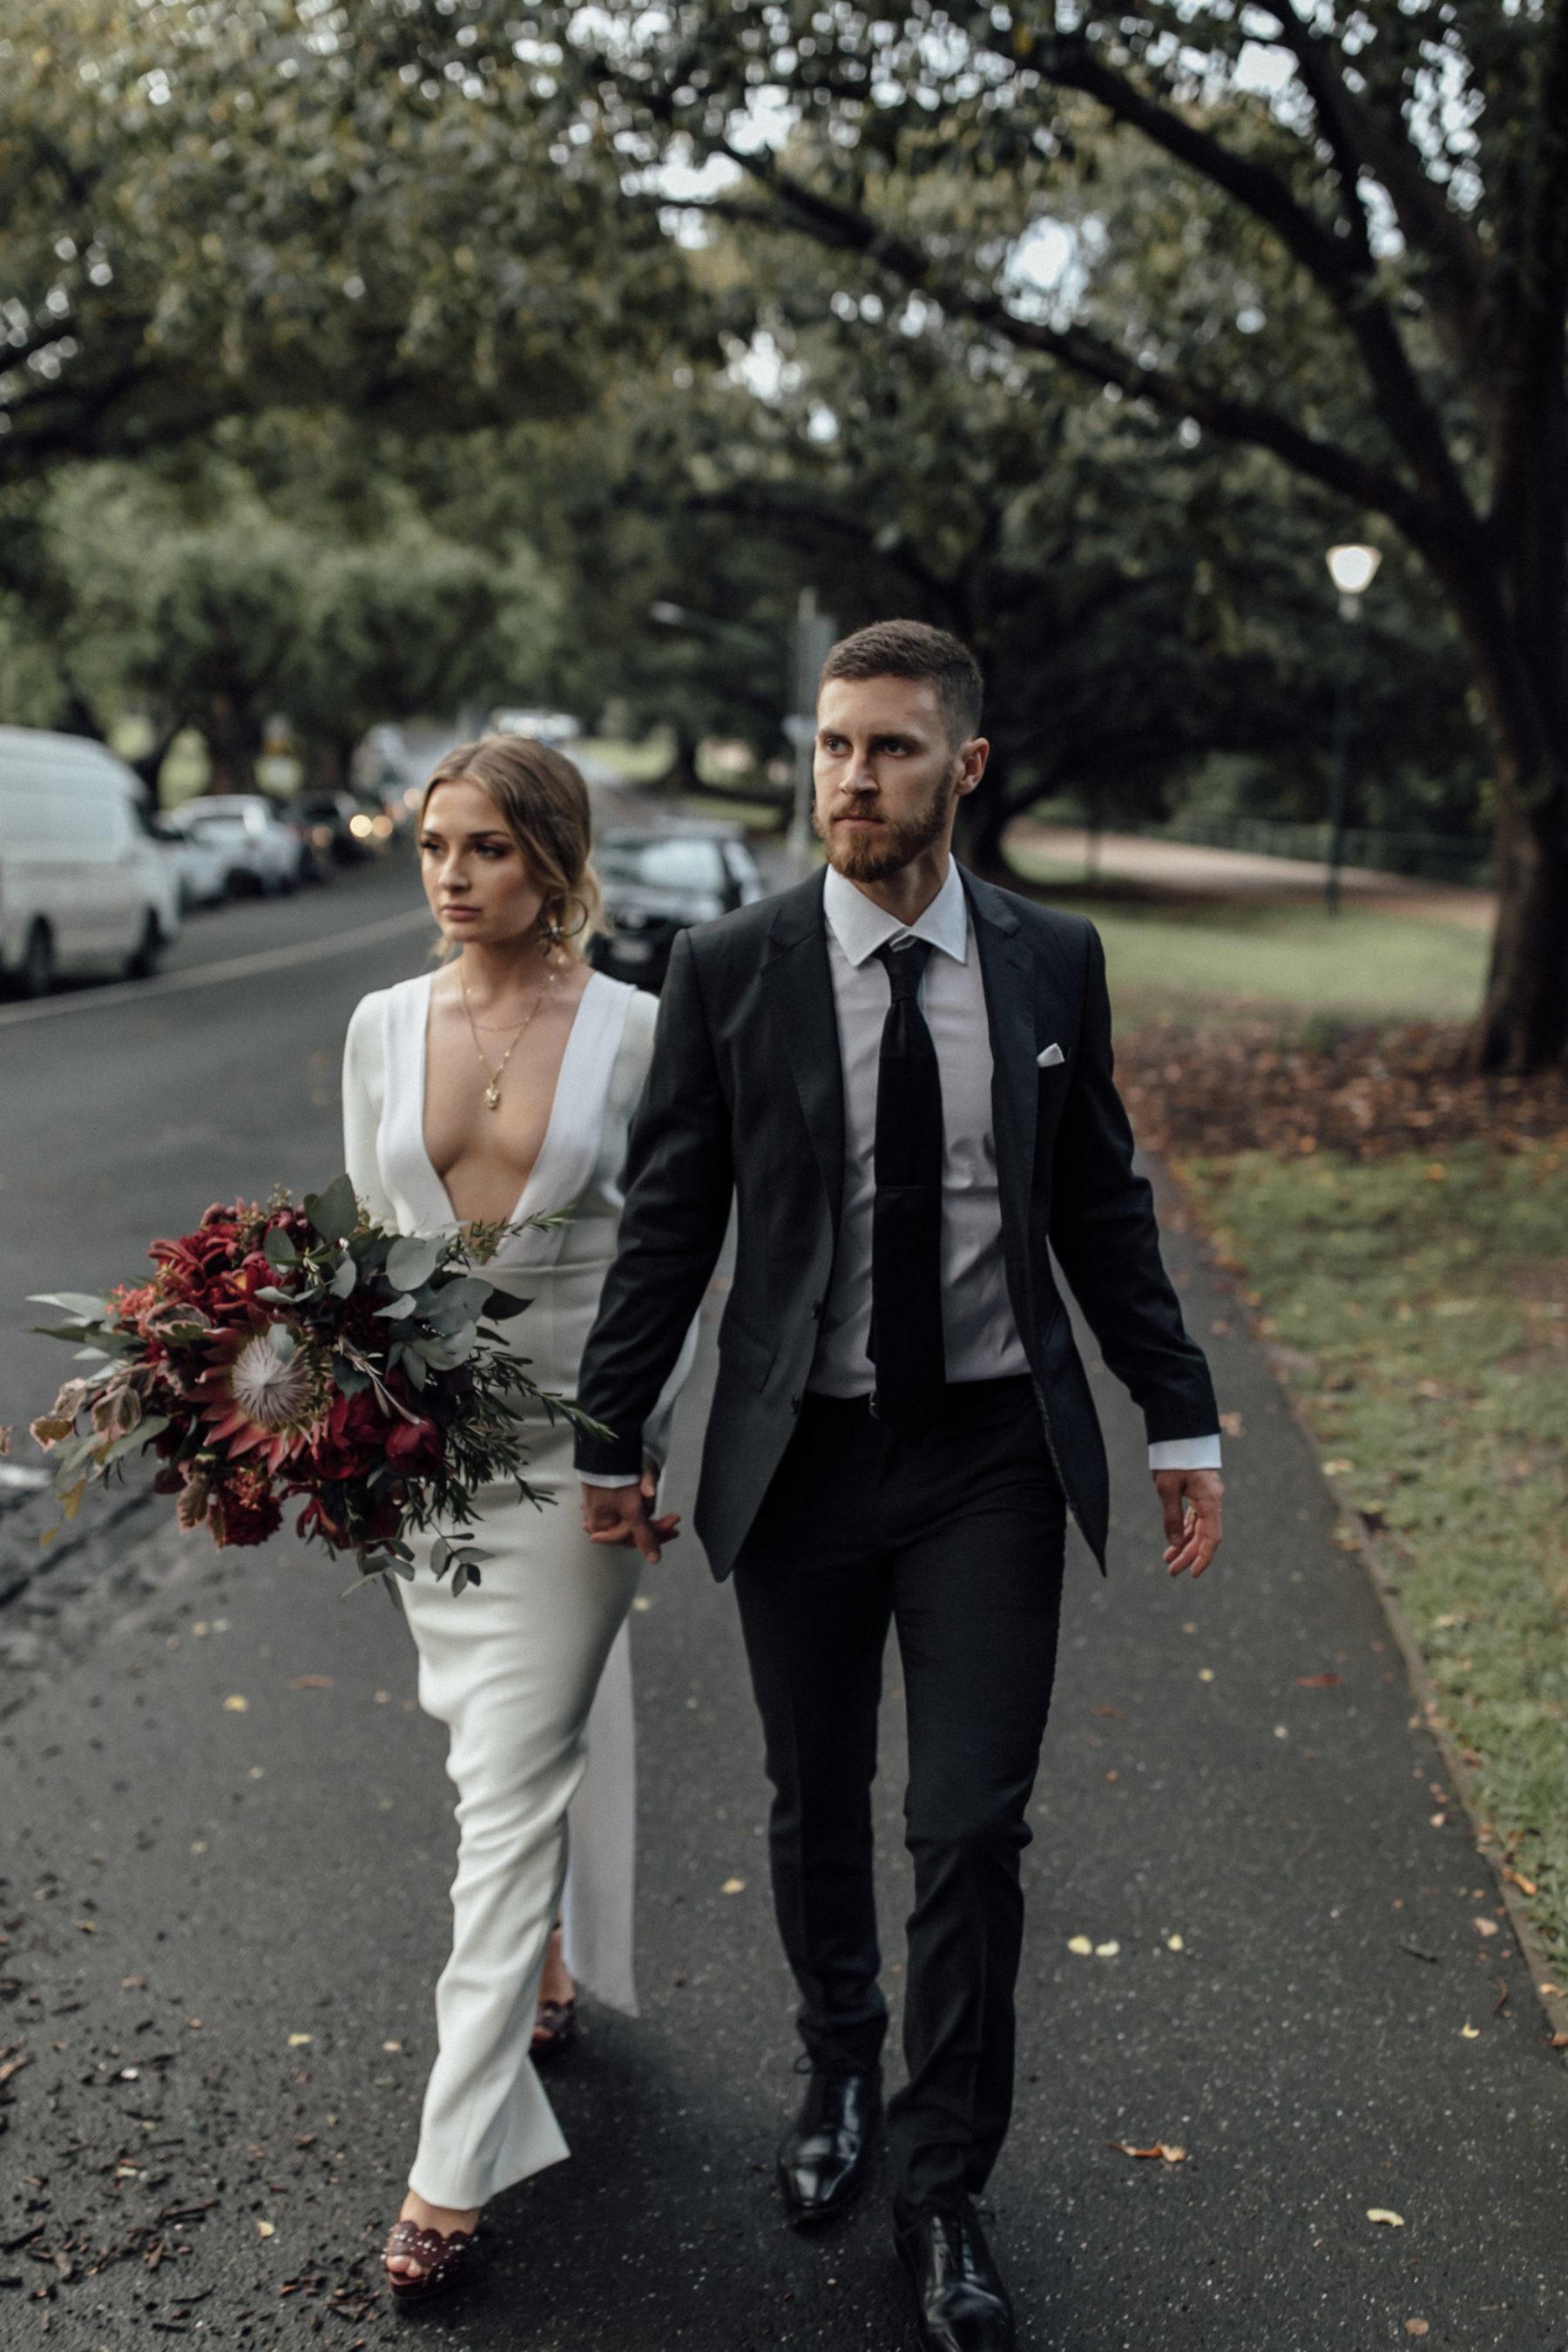 melbourne-wedding-prahran-jimmy-raper-photography-31-1800x0-c-default.jpg